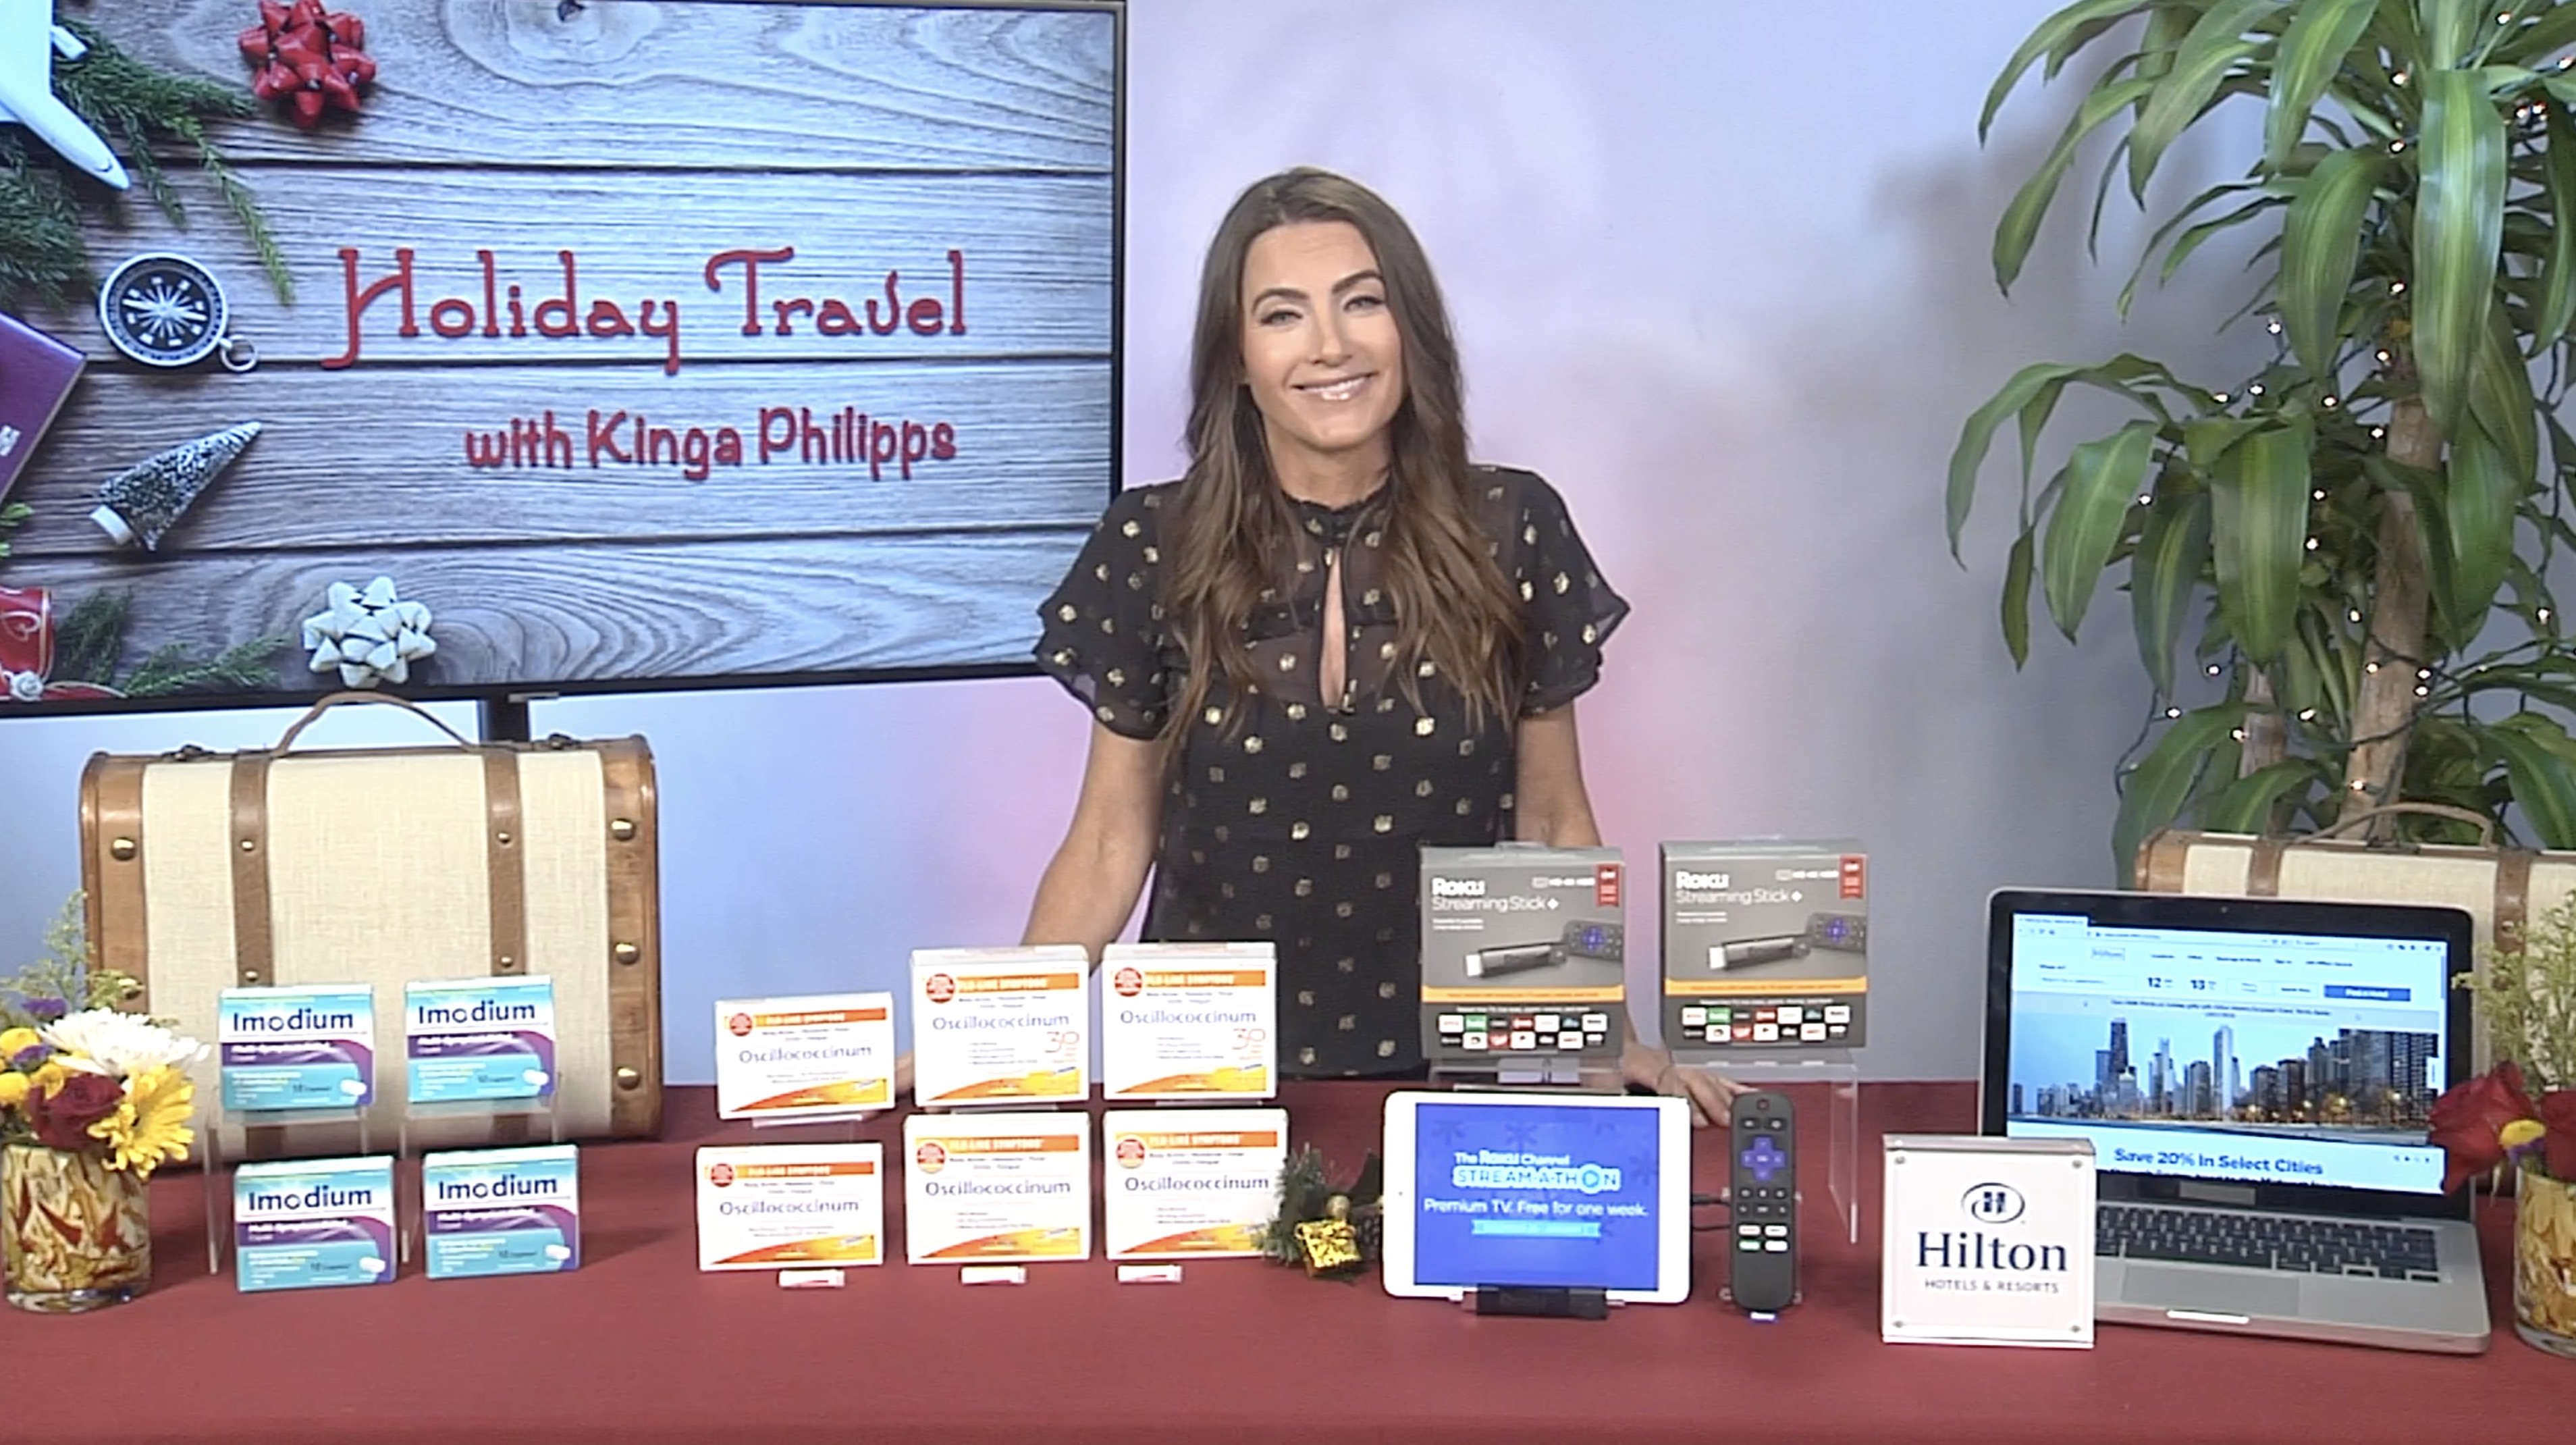 Adventure Journalist Kinga Philipps Shares Her Top Holiday